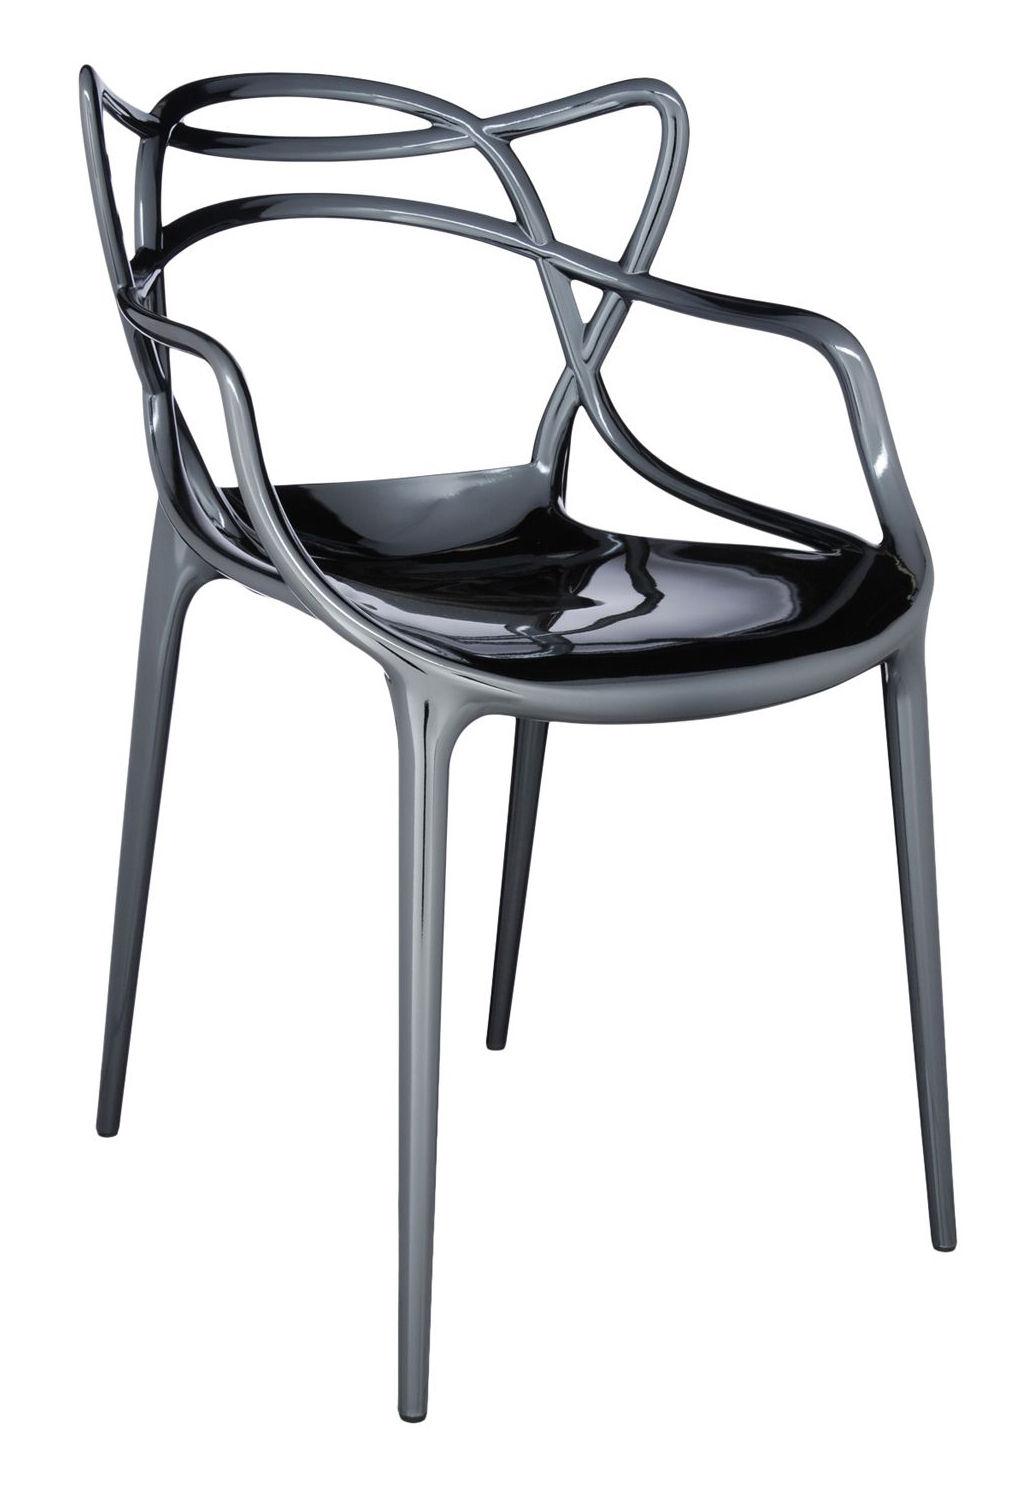 fauteuil empilable masters m tallis titane kartell. Black Bedroom Furniture Sets. Home Design Ideas